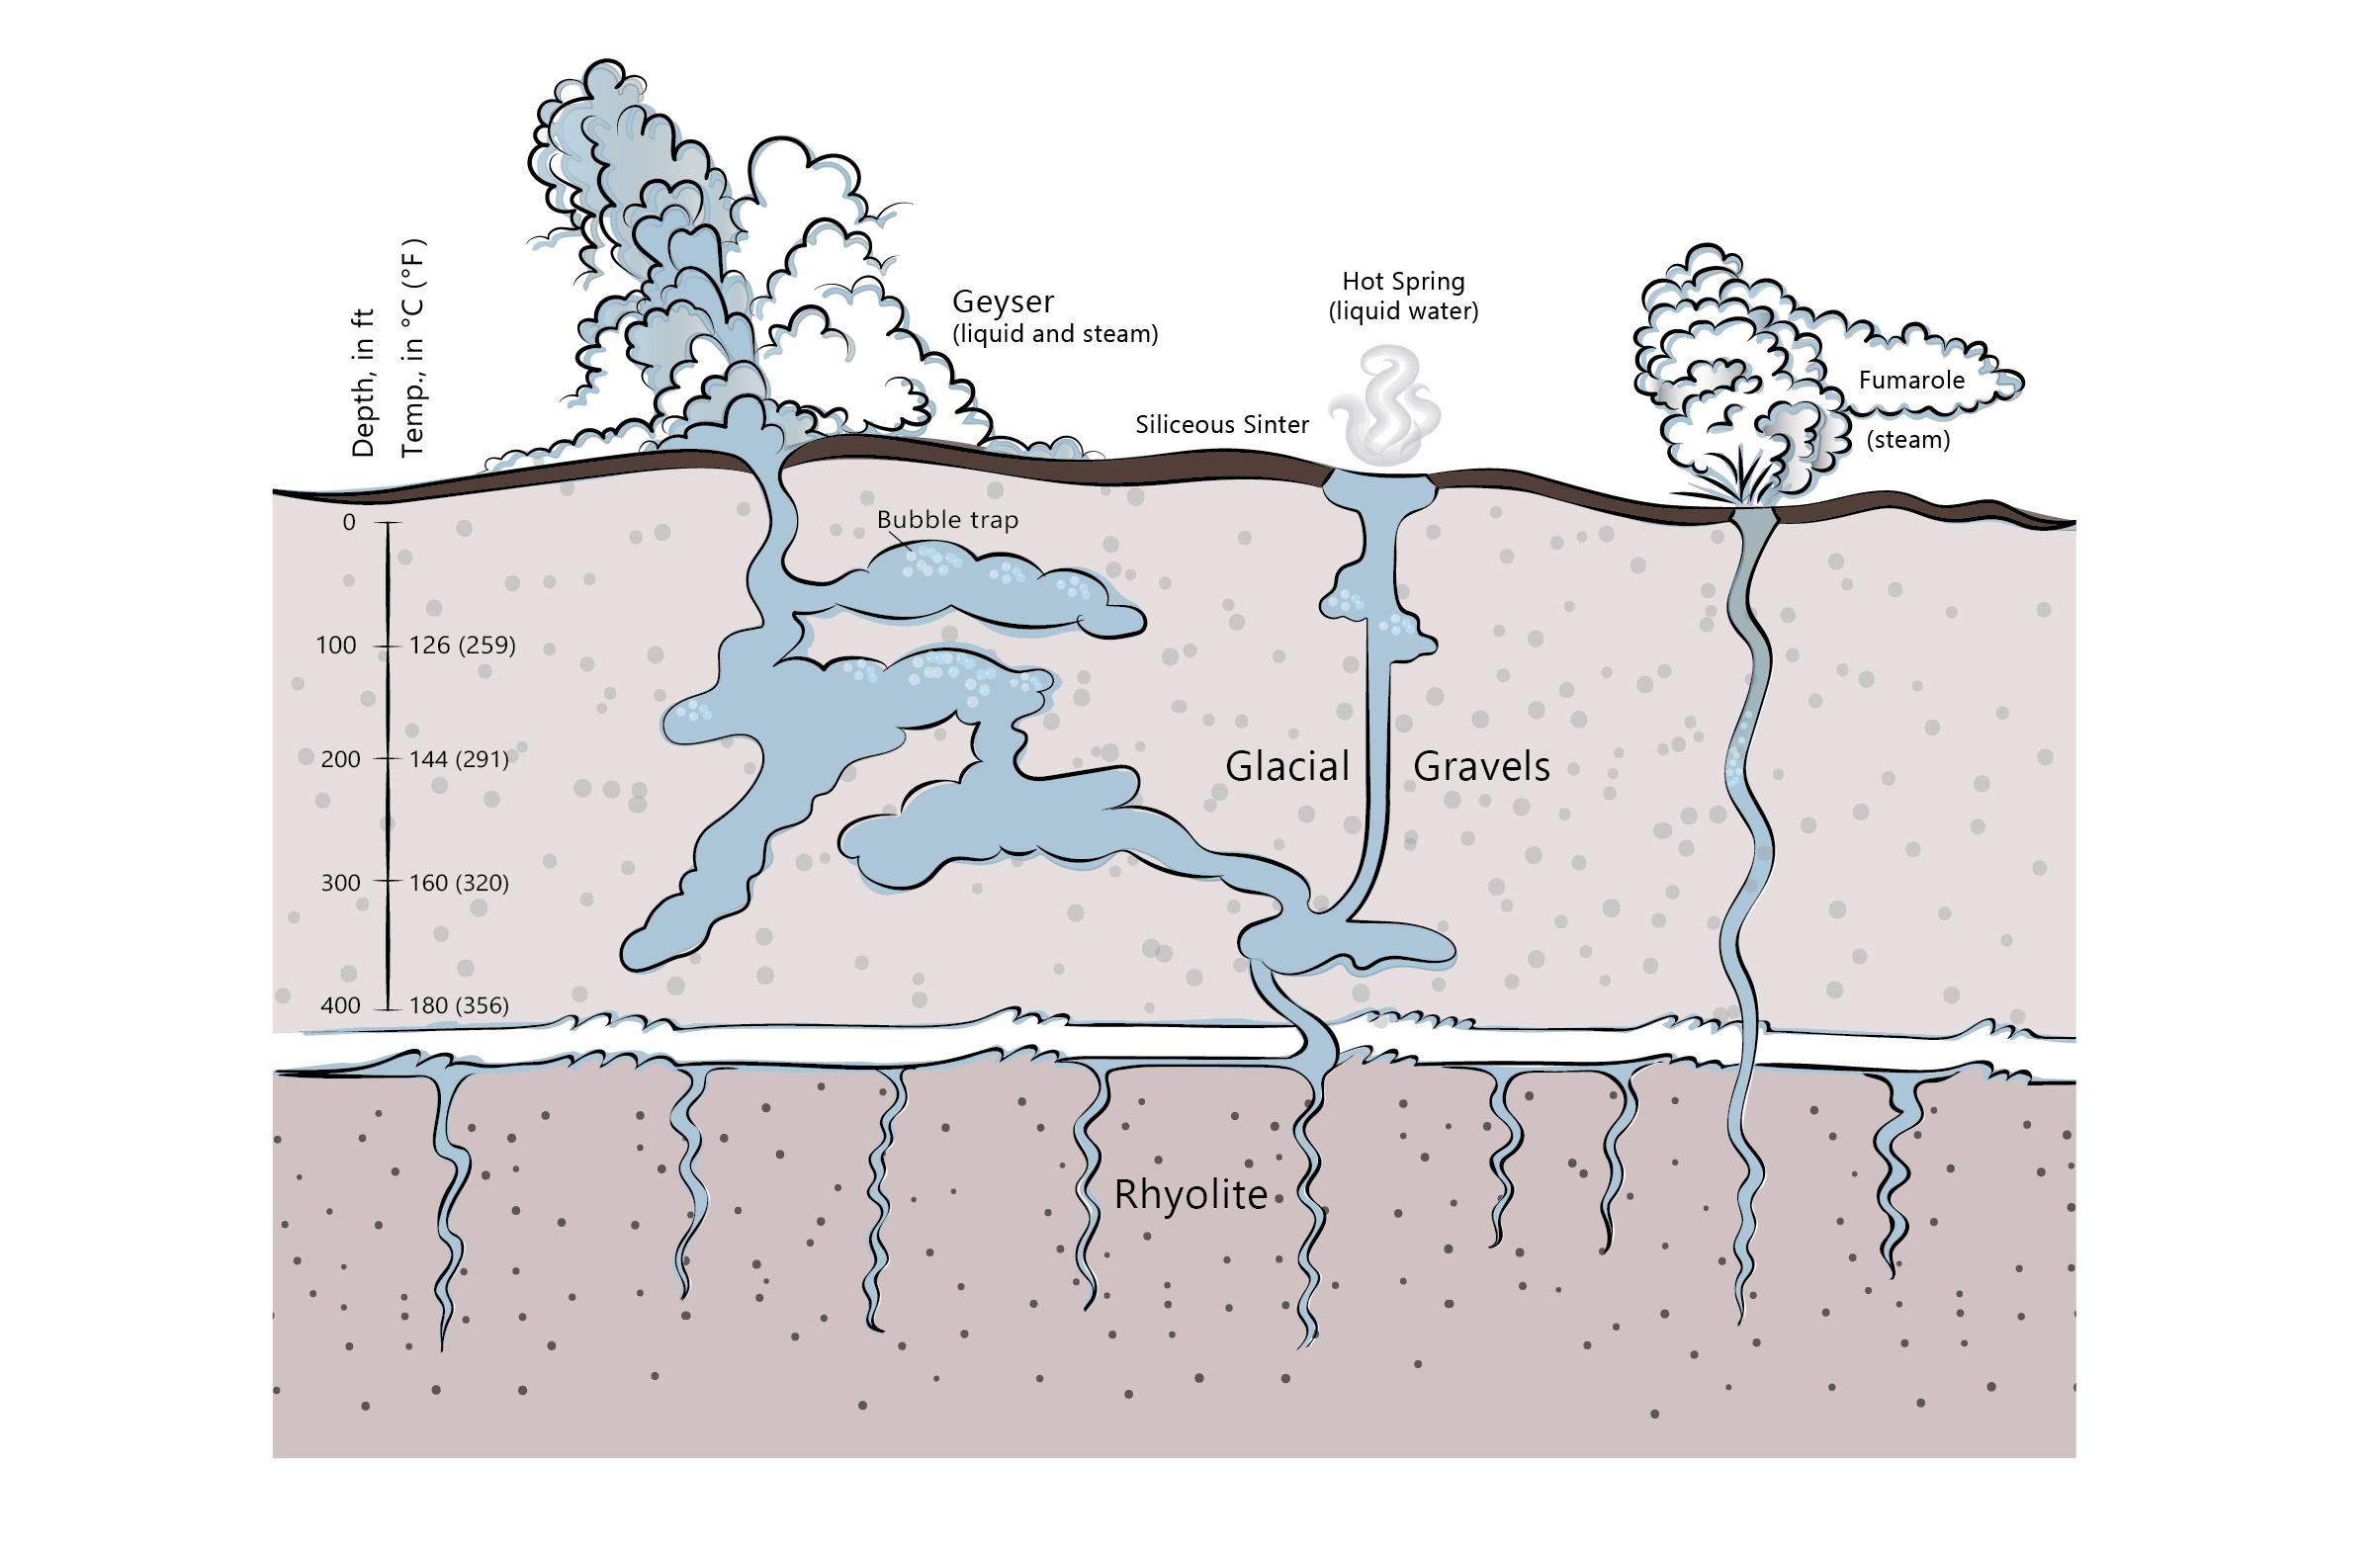 2407x1571 The Complex Dynamics Of Geyser Eruptions